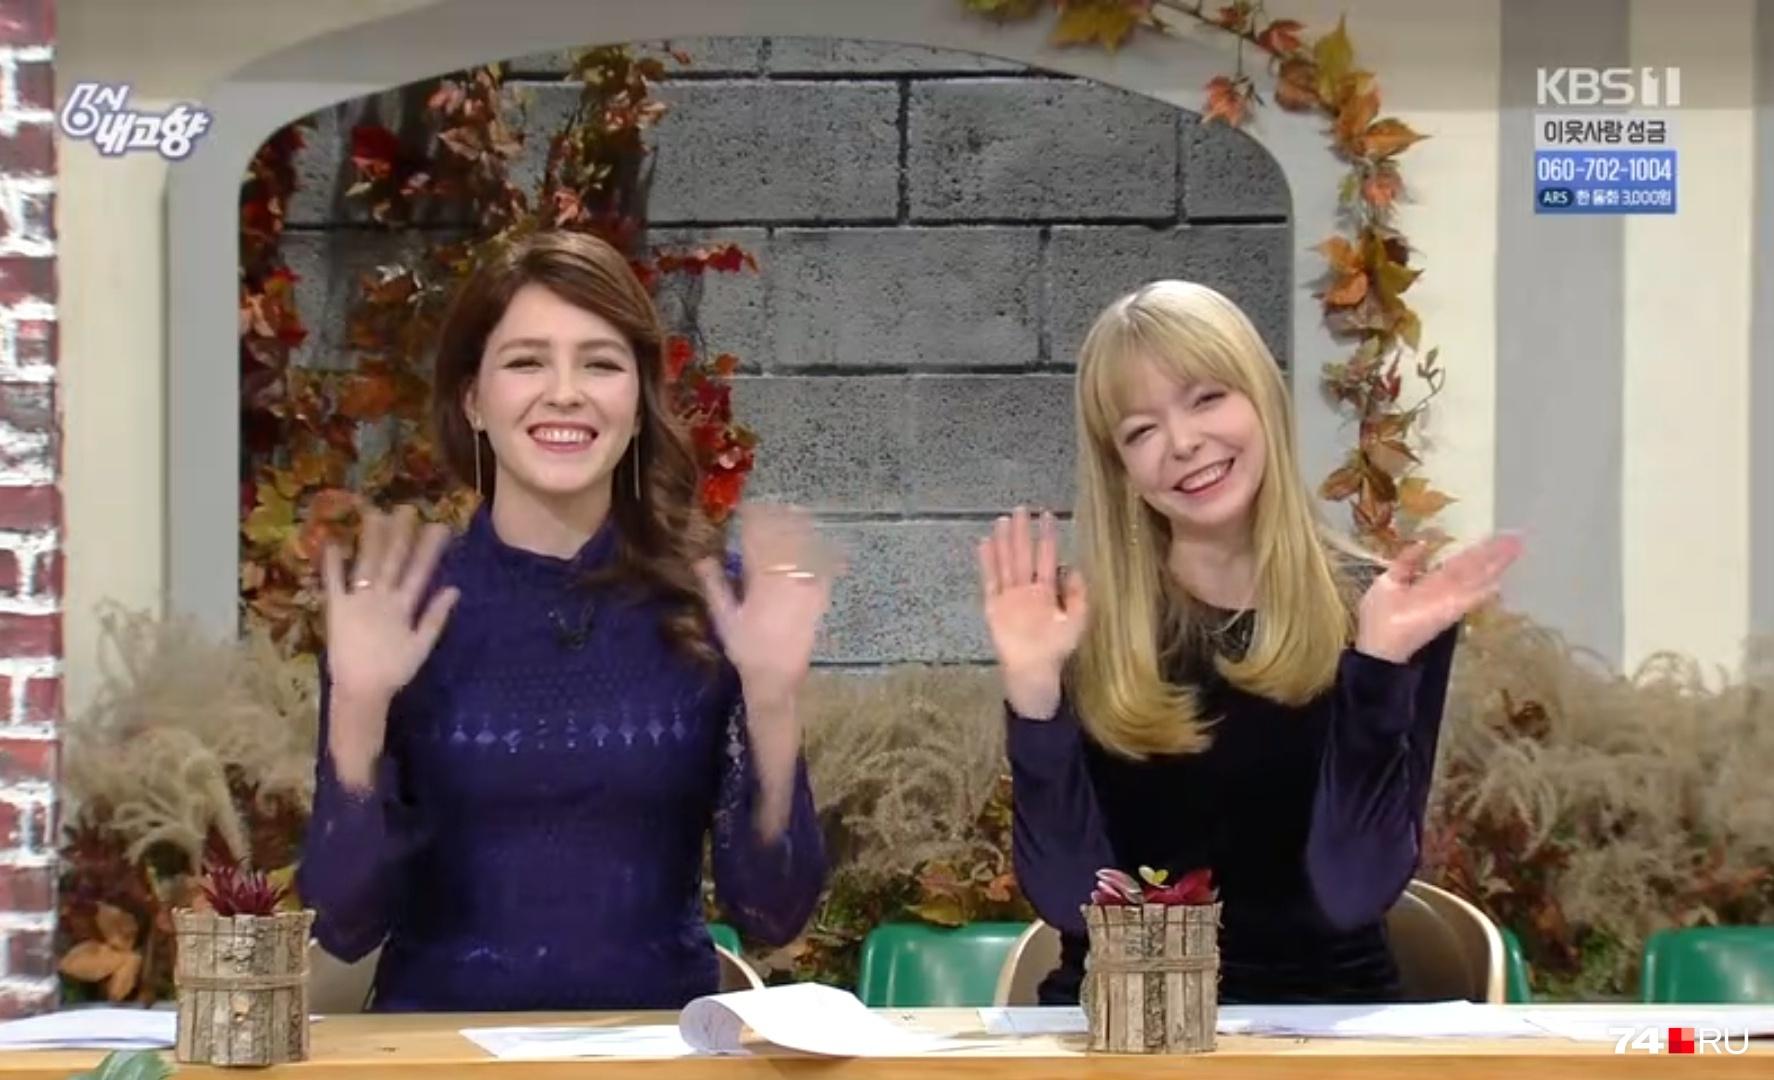 Кадр со съёмок на корейском телевидении